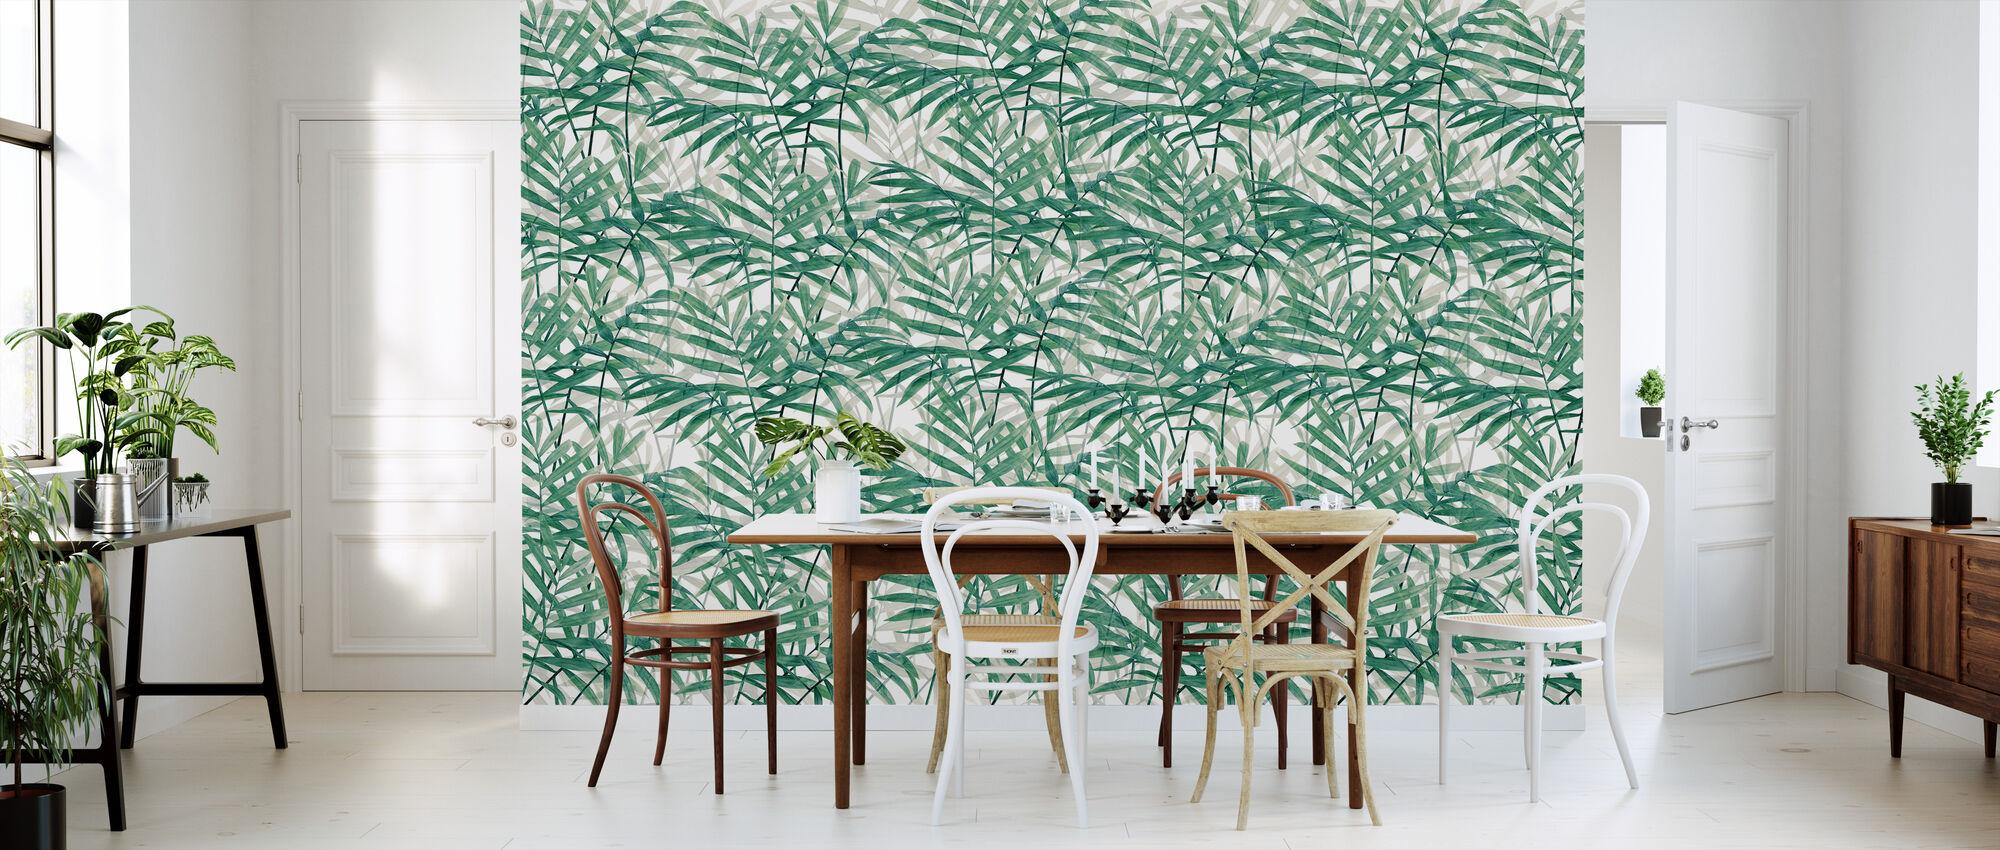 Green Leaf Plant - Wallpaper - Kitchen